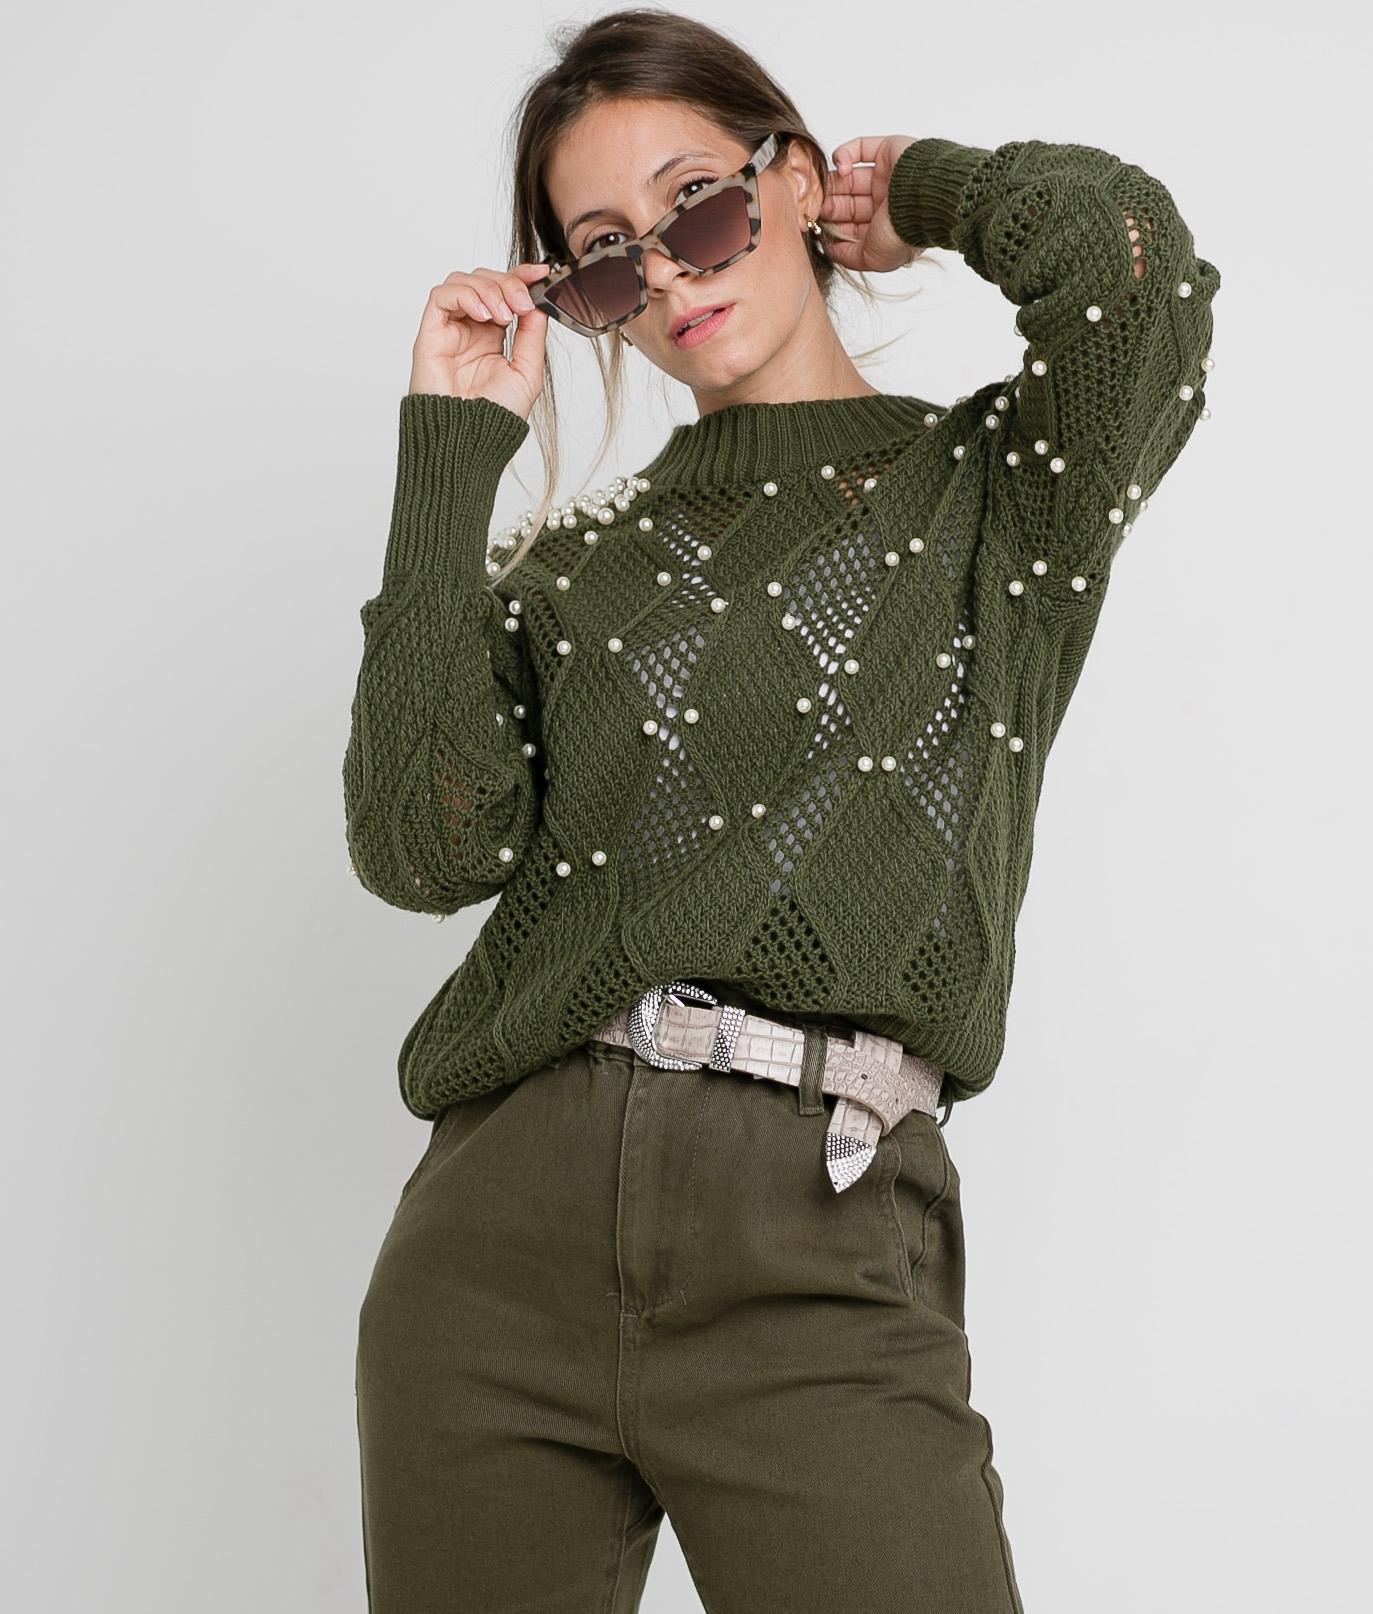 Pirlan Sweater - Khaki